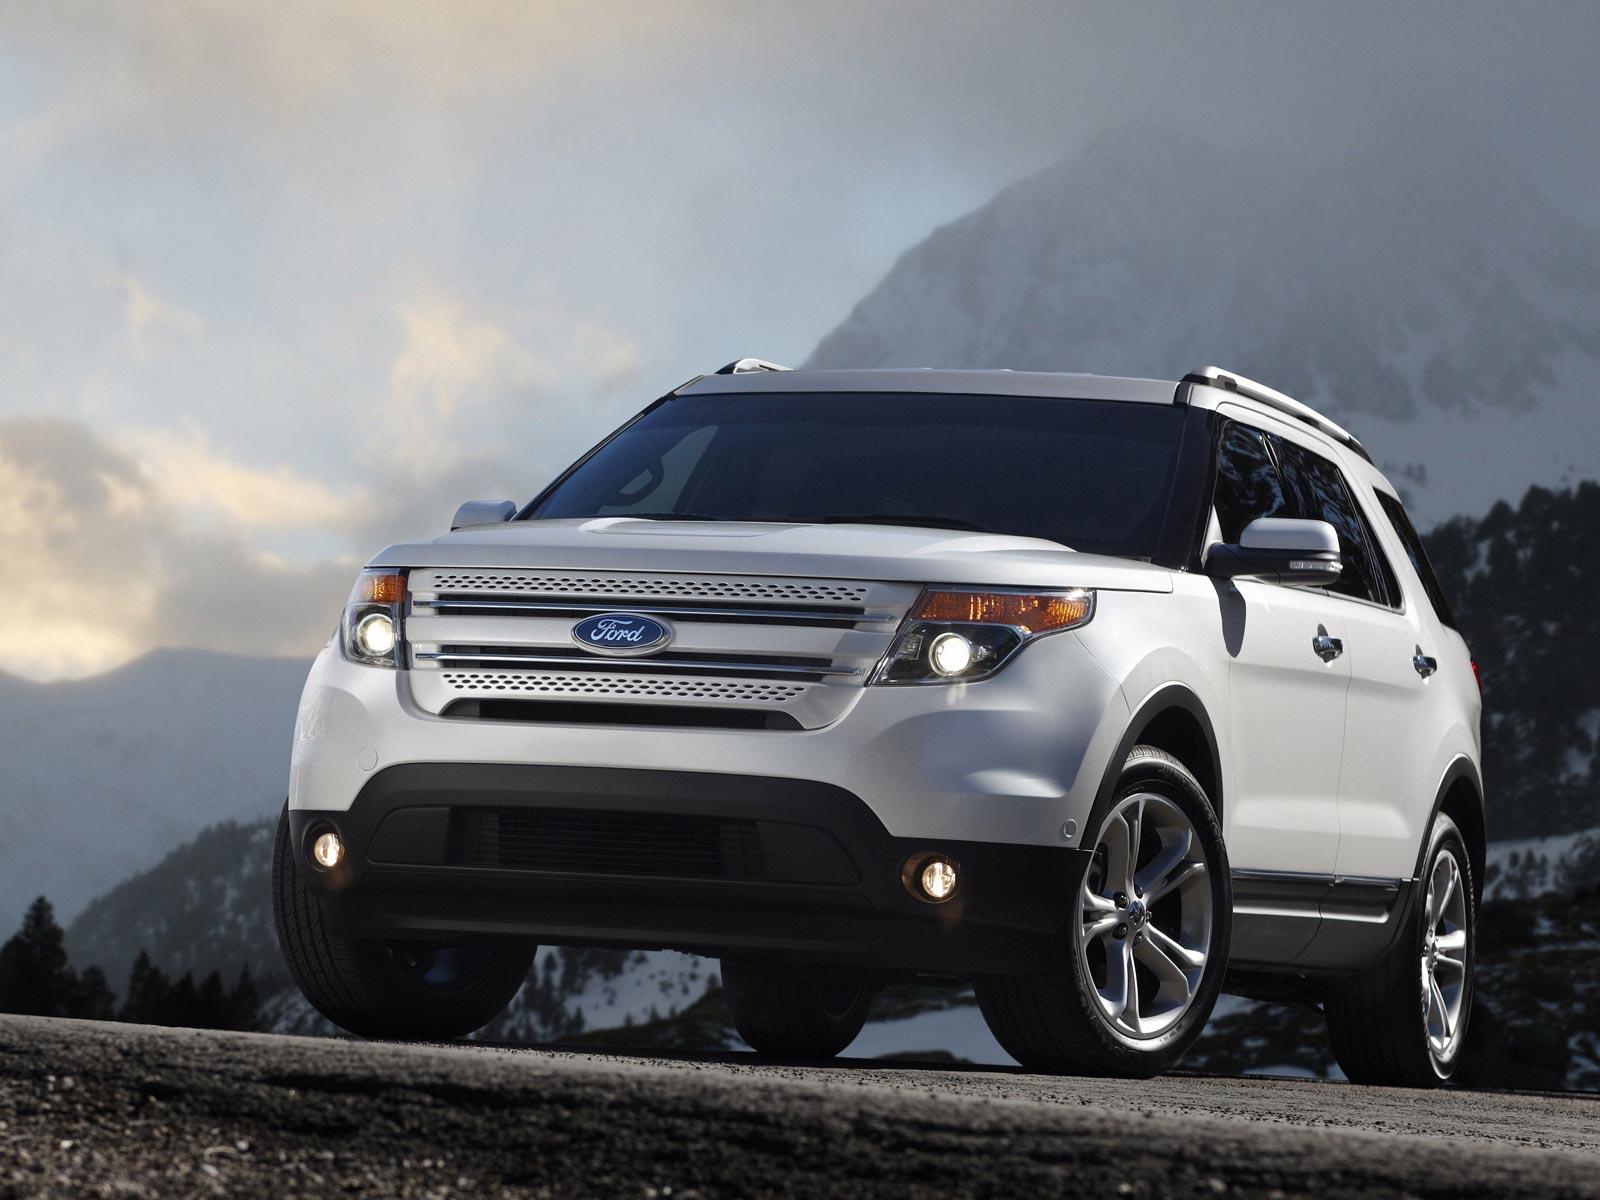 Ford 3.5 Ecoboost >> Ford Explorer 2011 – AutoGuru.at